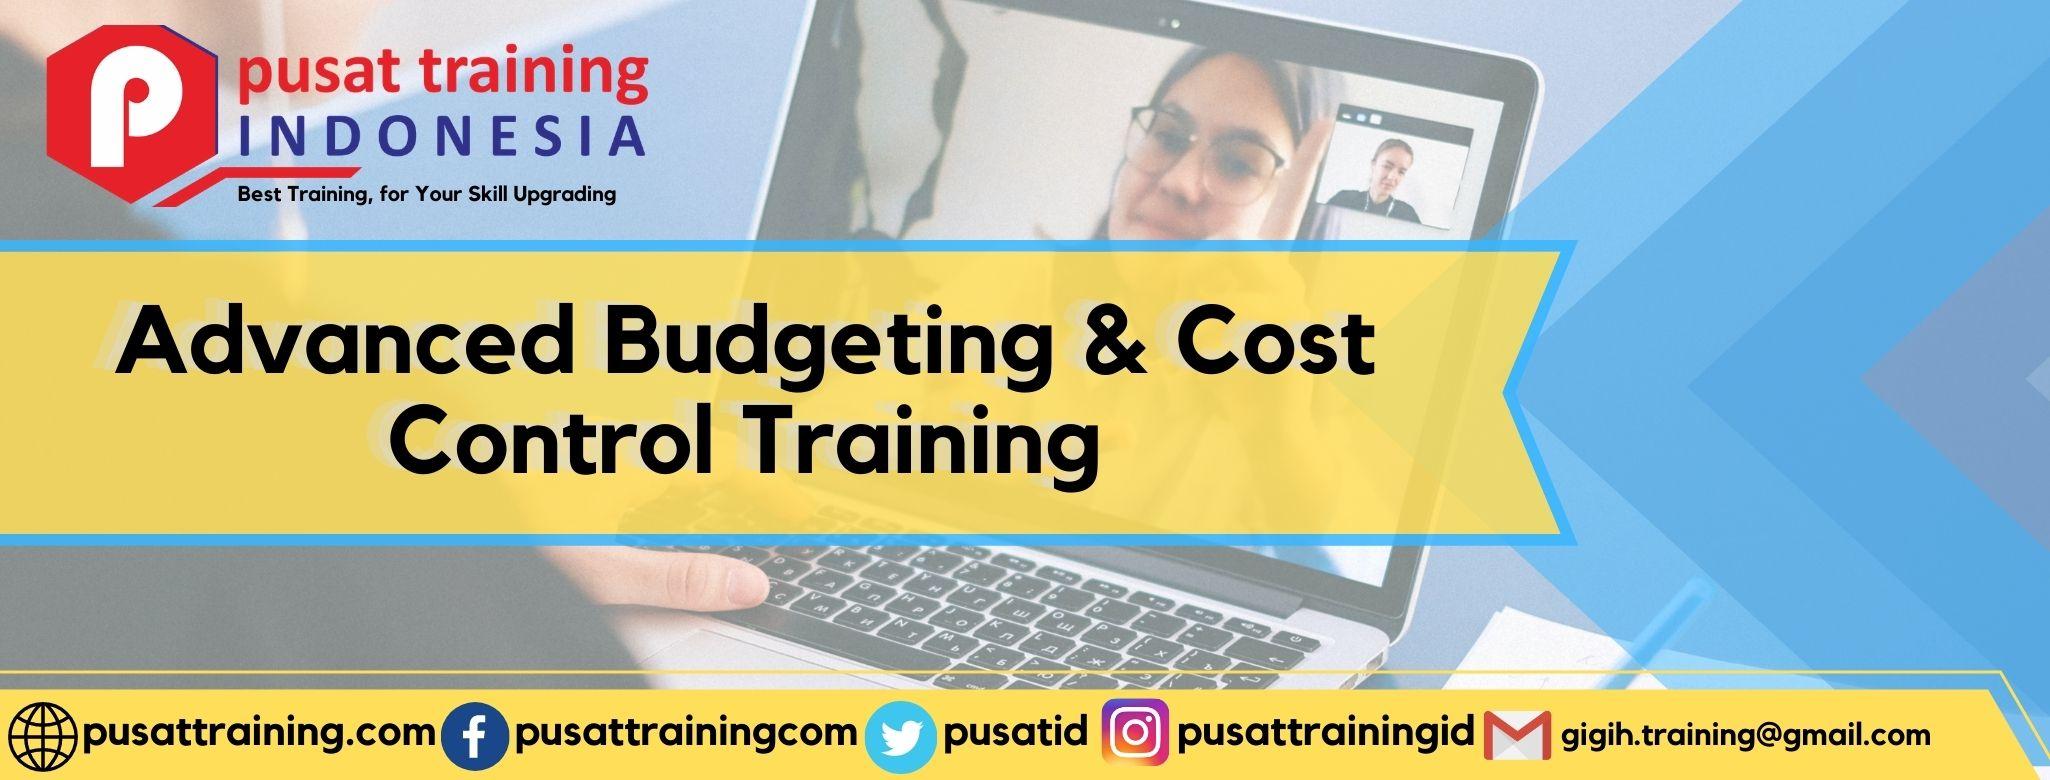 Advanced Budgeting & Cost Control Training